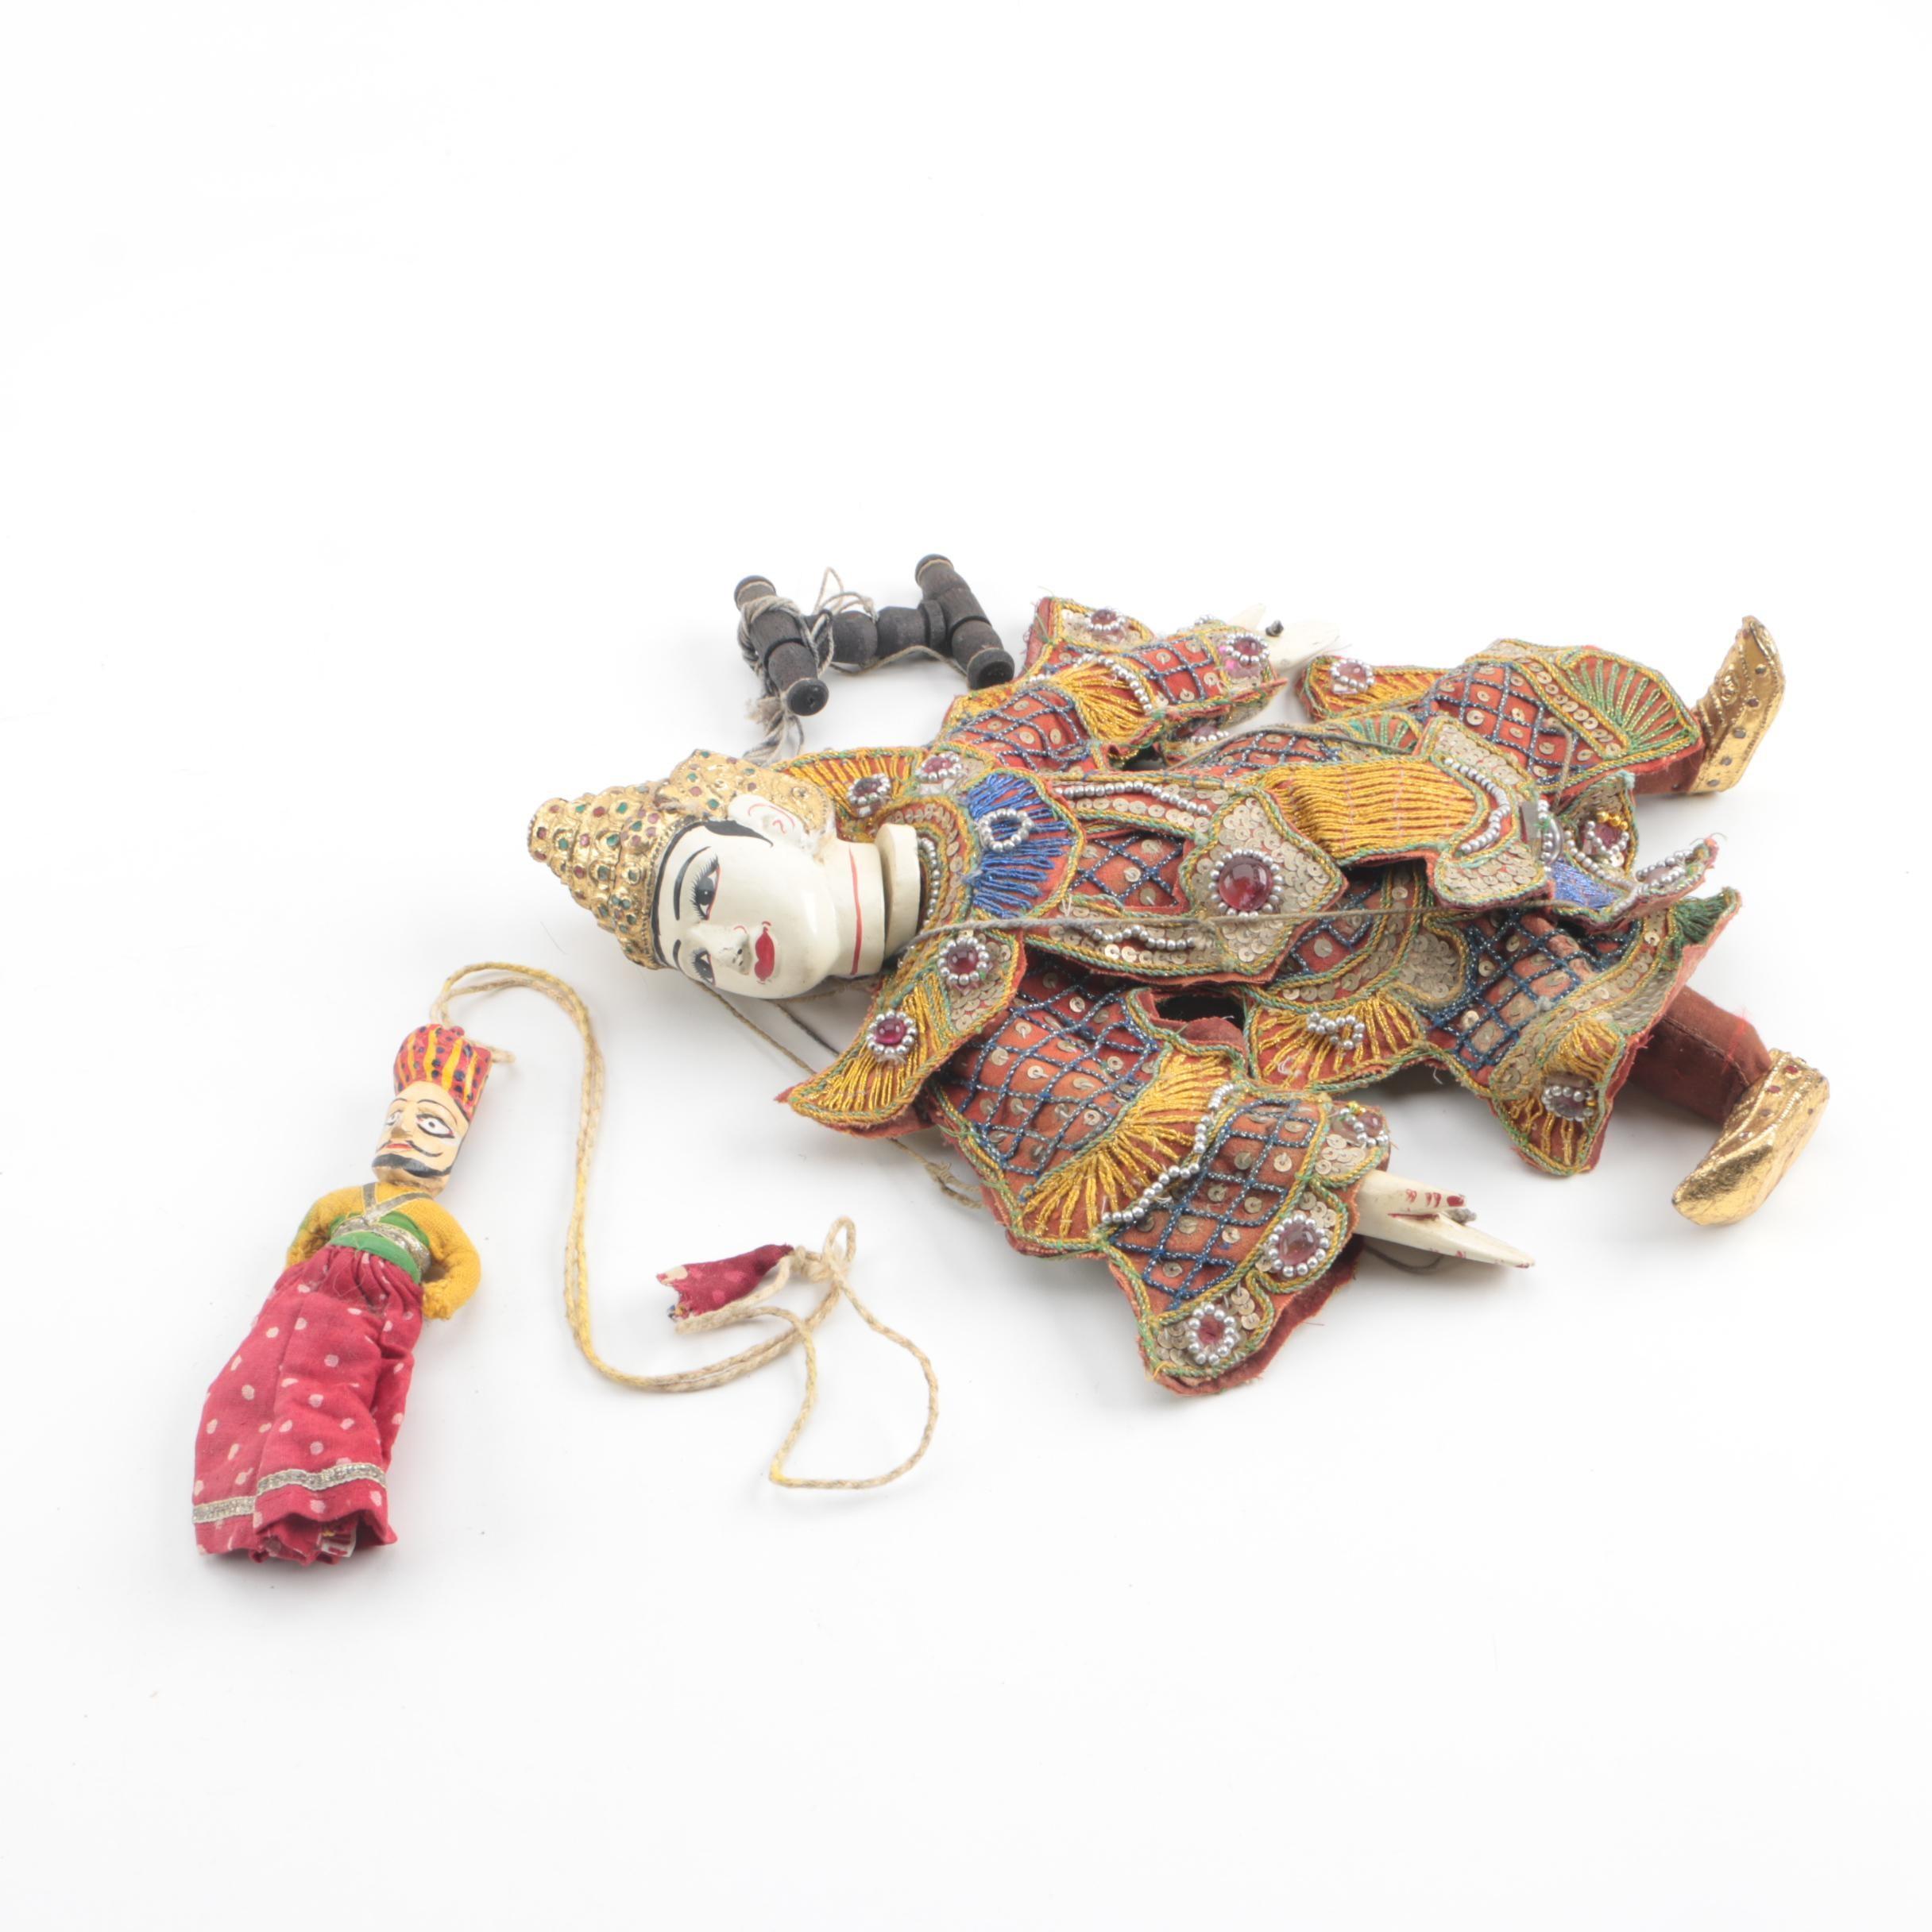 Burmese Style Yoke Thé Puppets